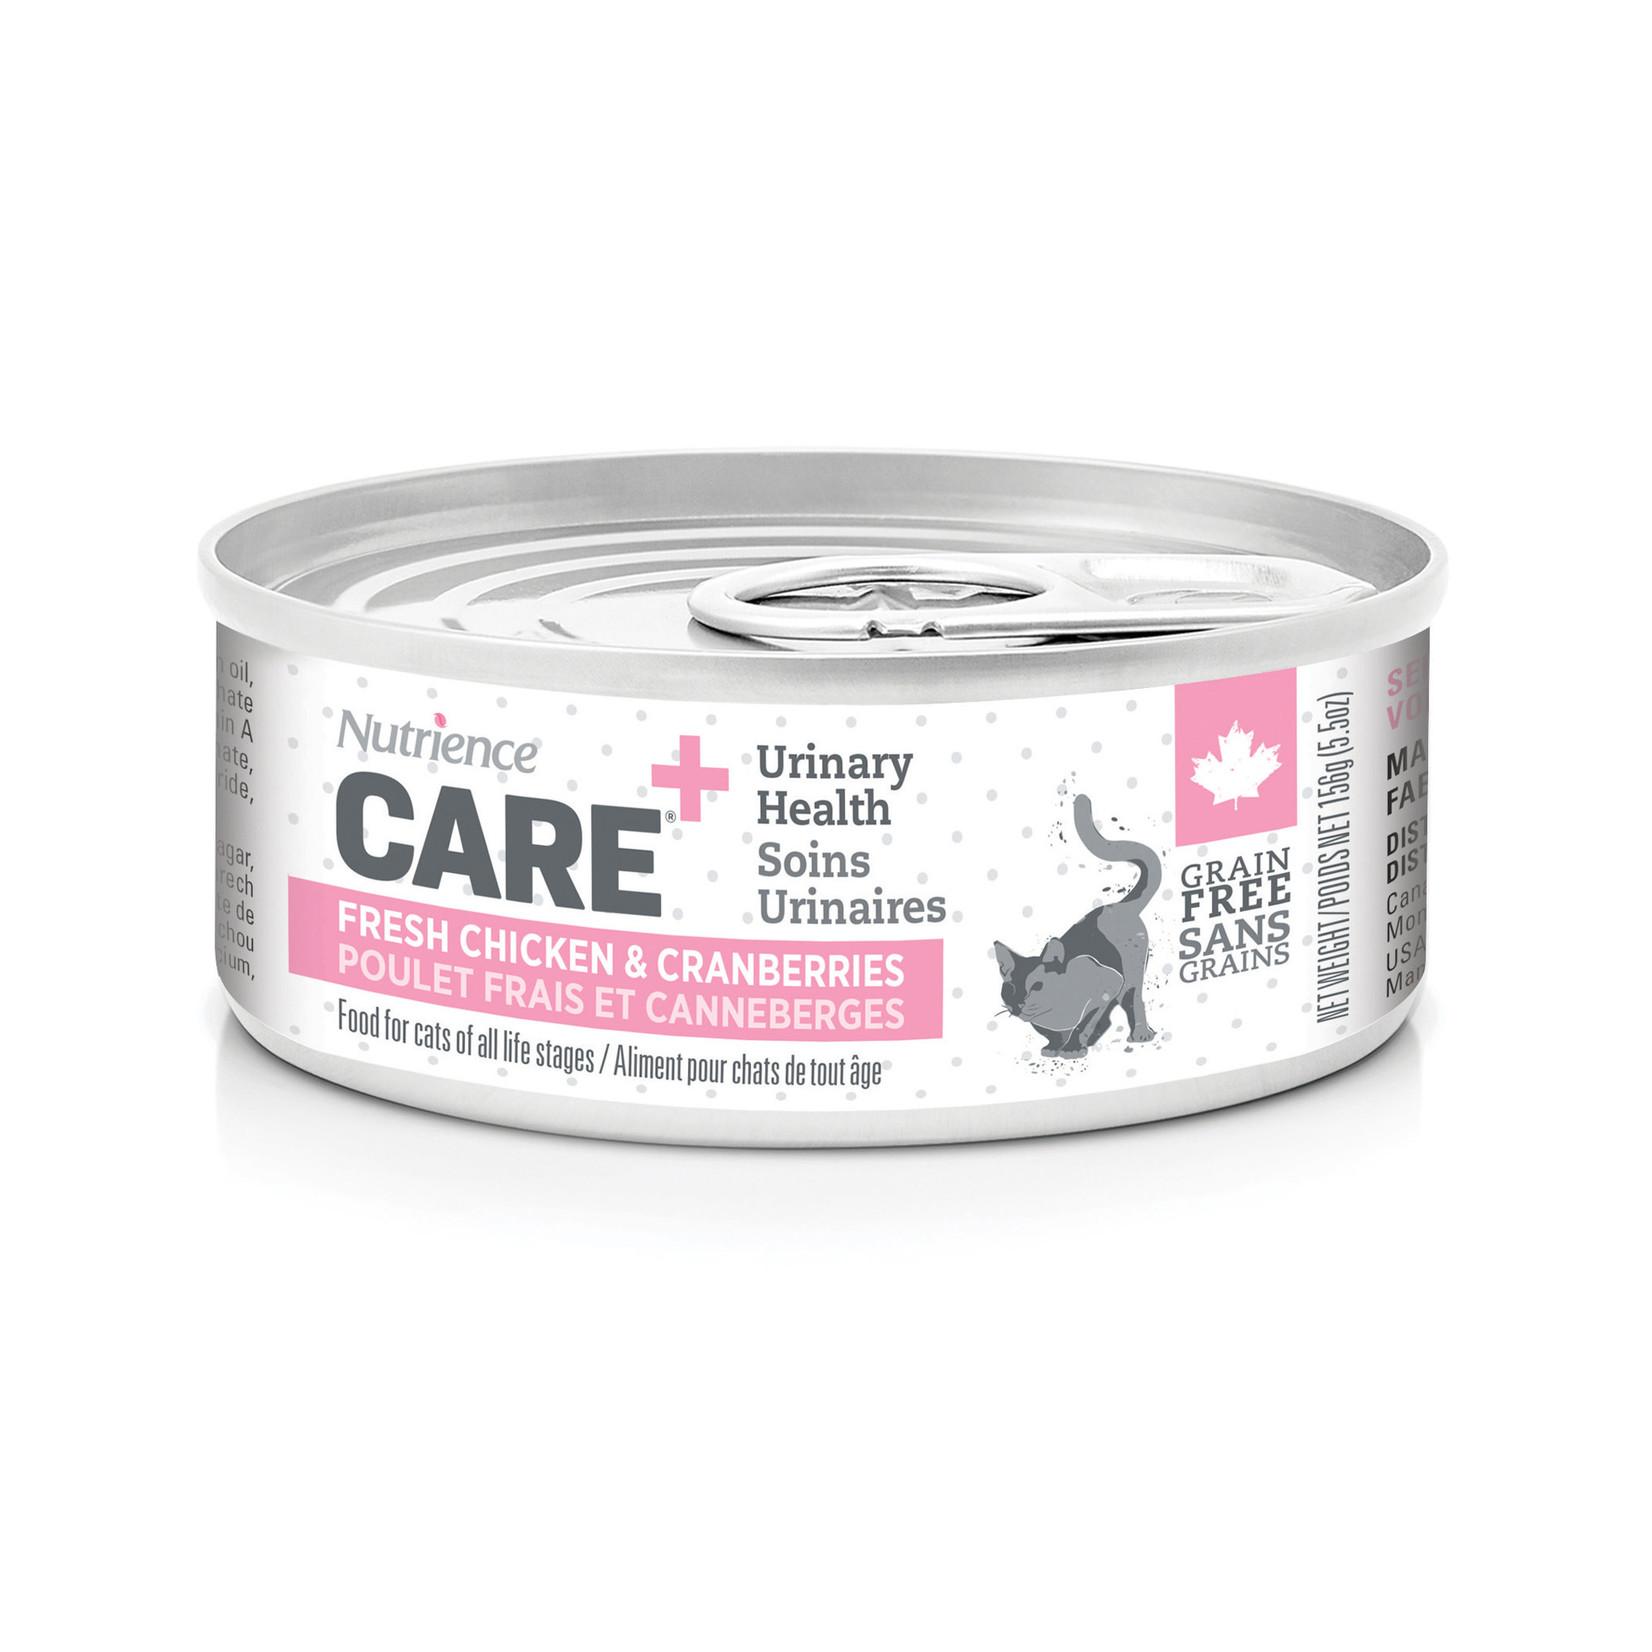 Nutrience Care Urinary Health Cat Food 156gm